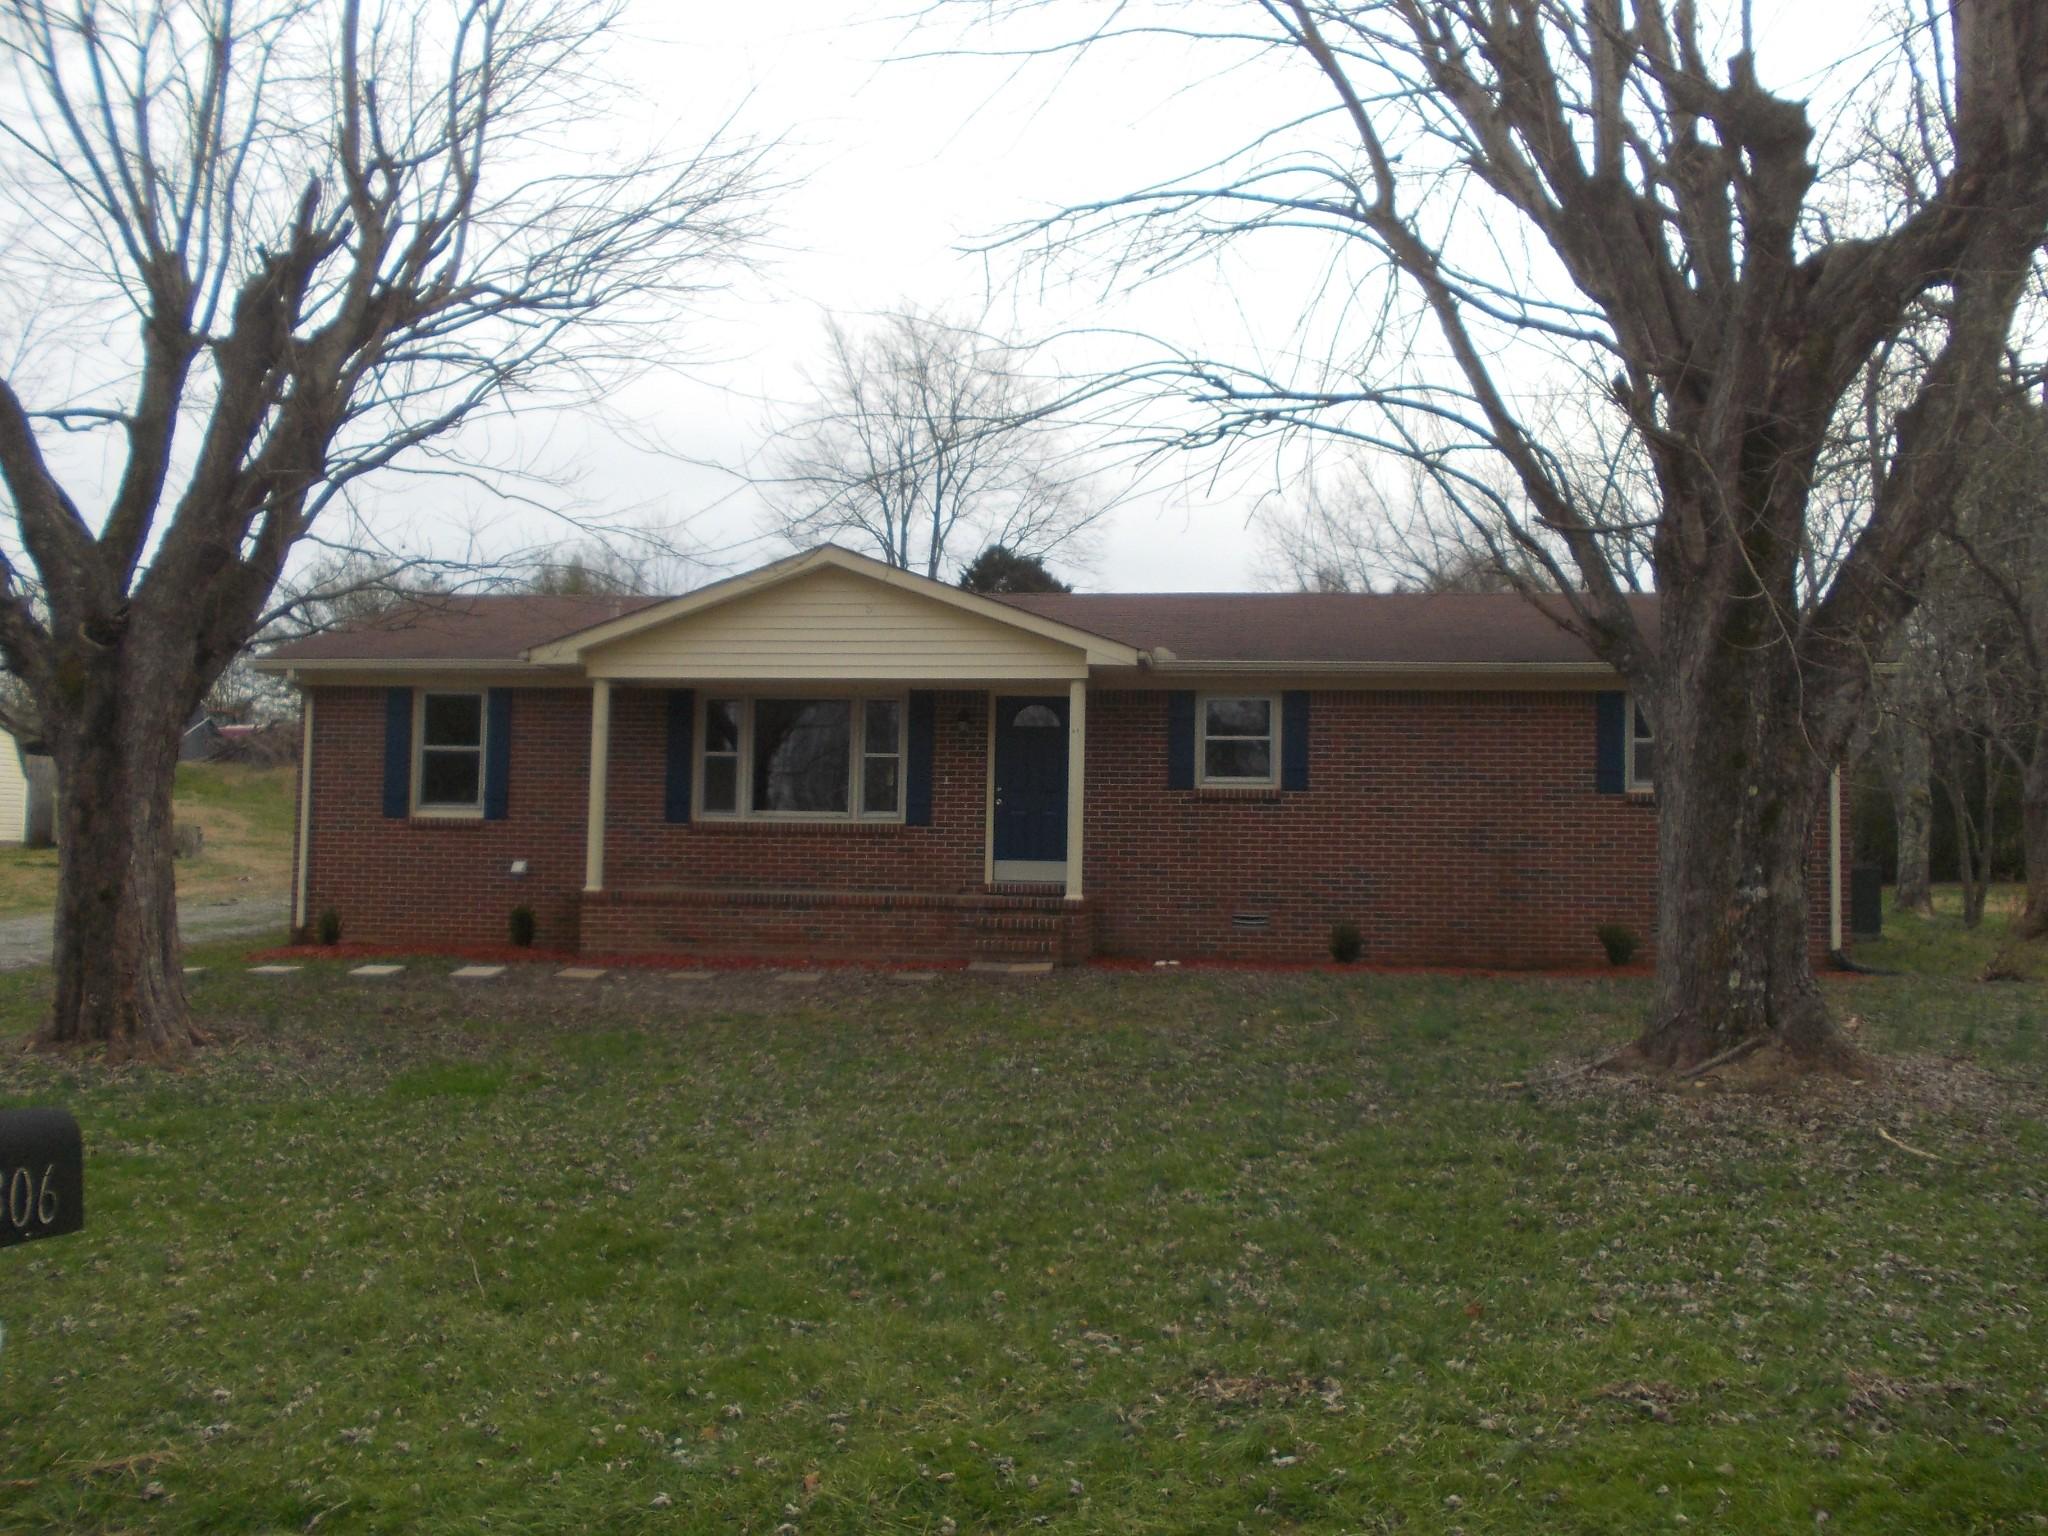 306 Circle Hill Dr, Mc Minnville, TN 37110 - Mc Minnville, TN real estate listing